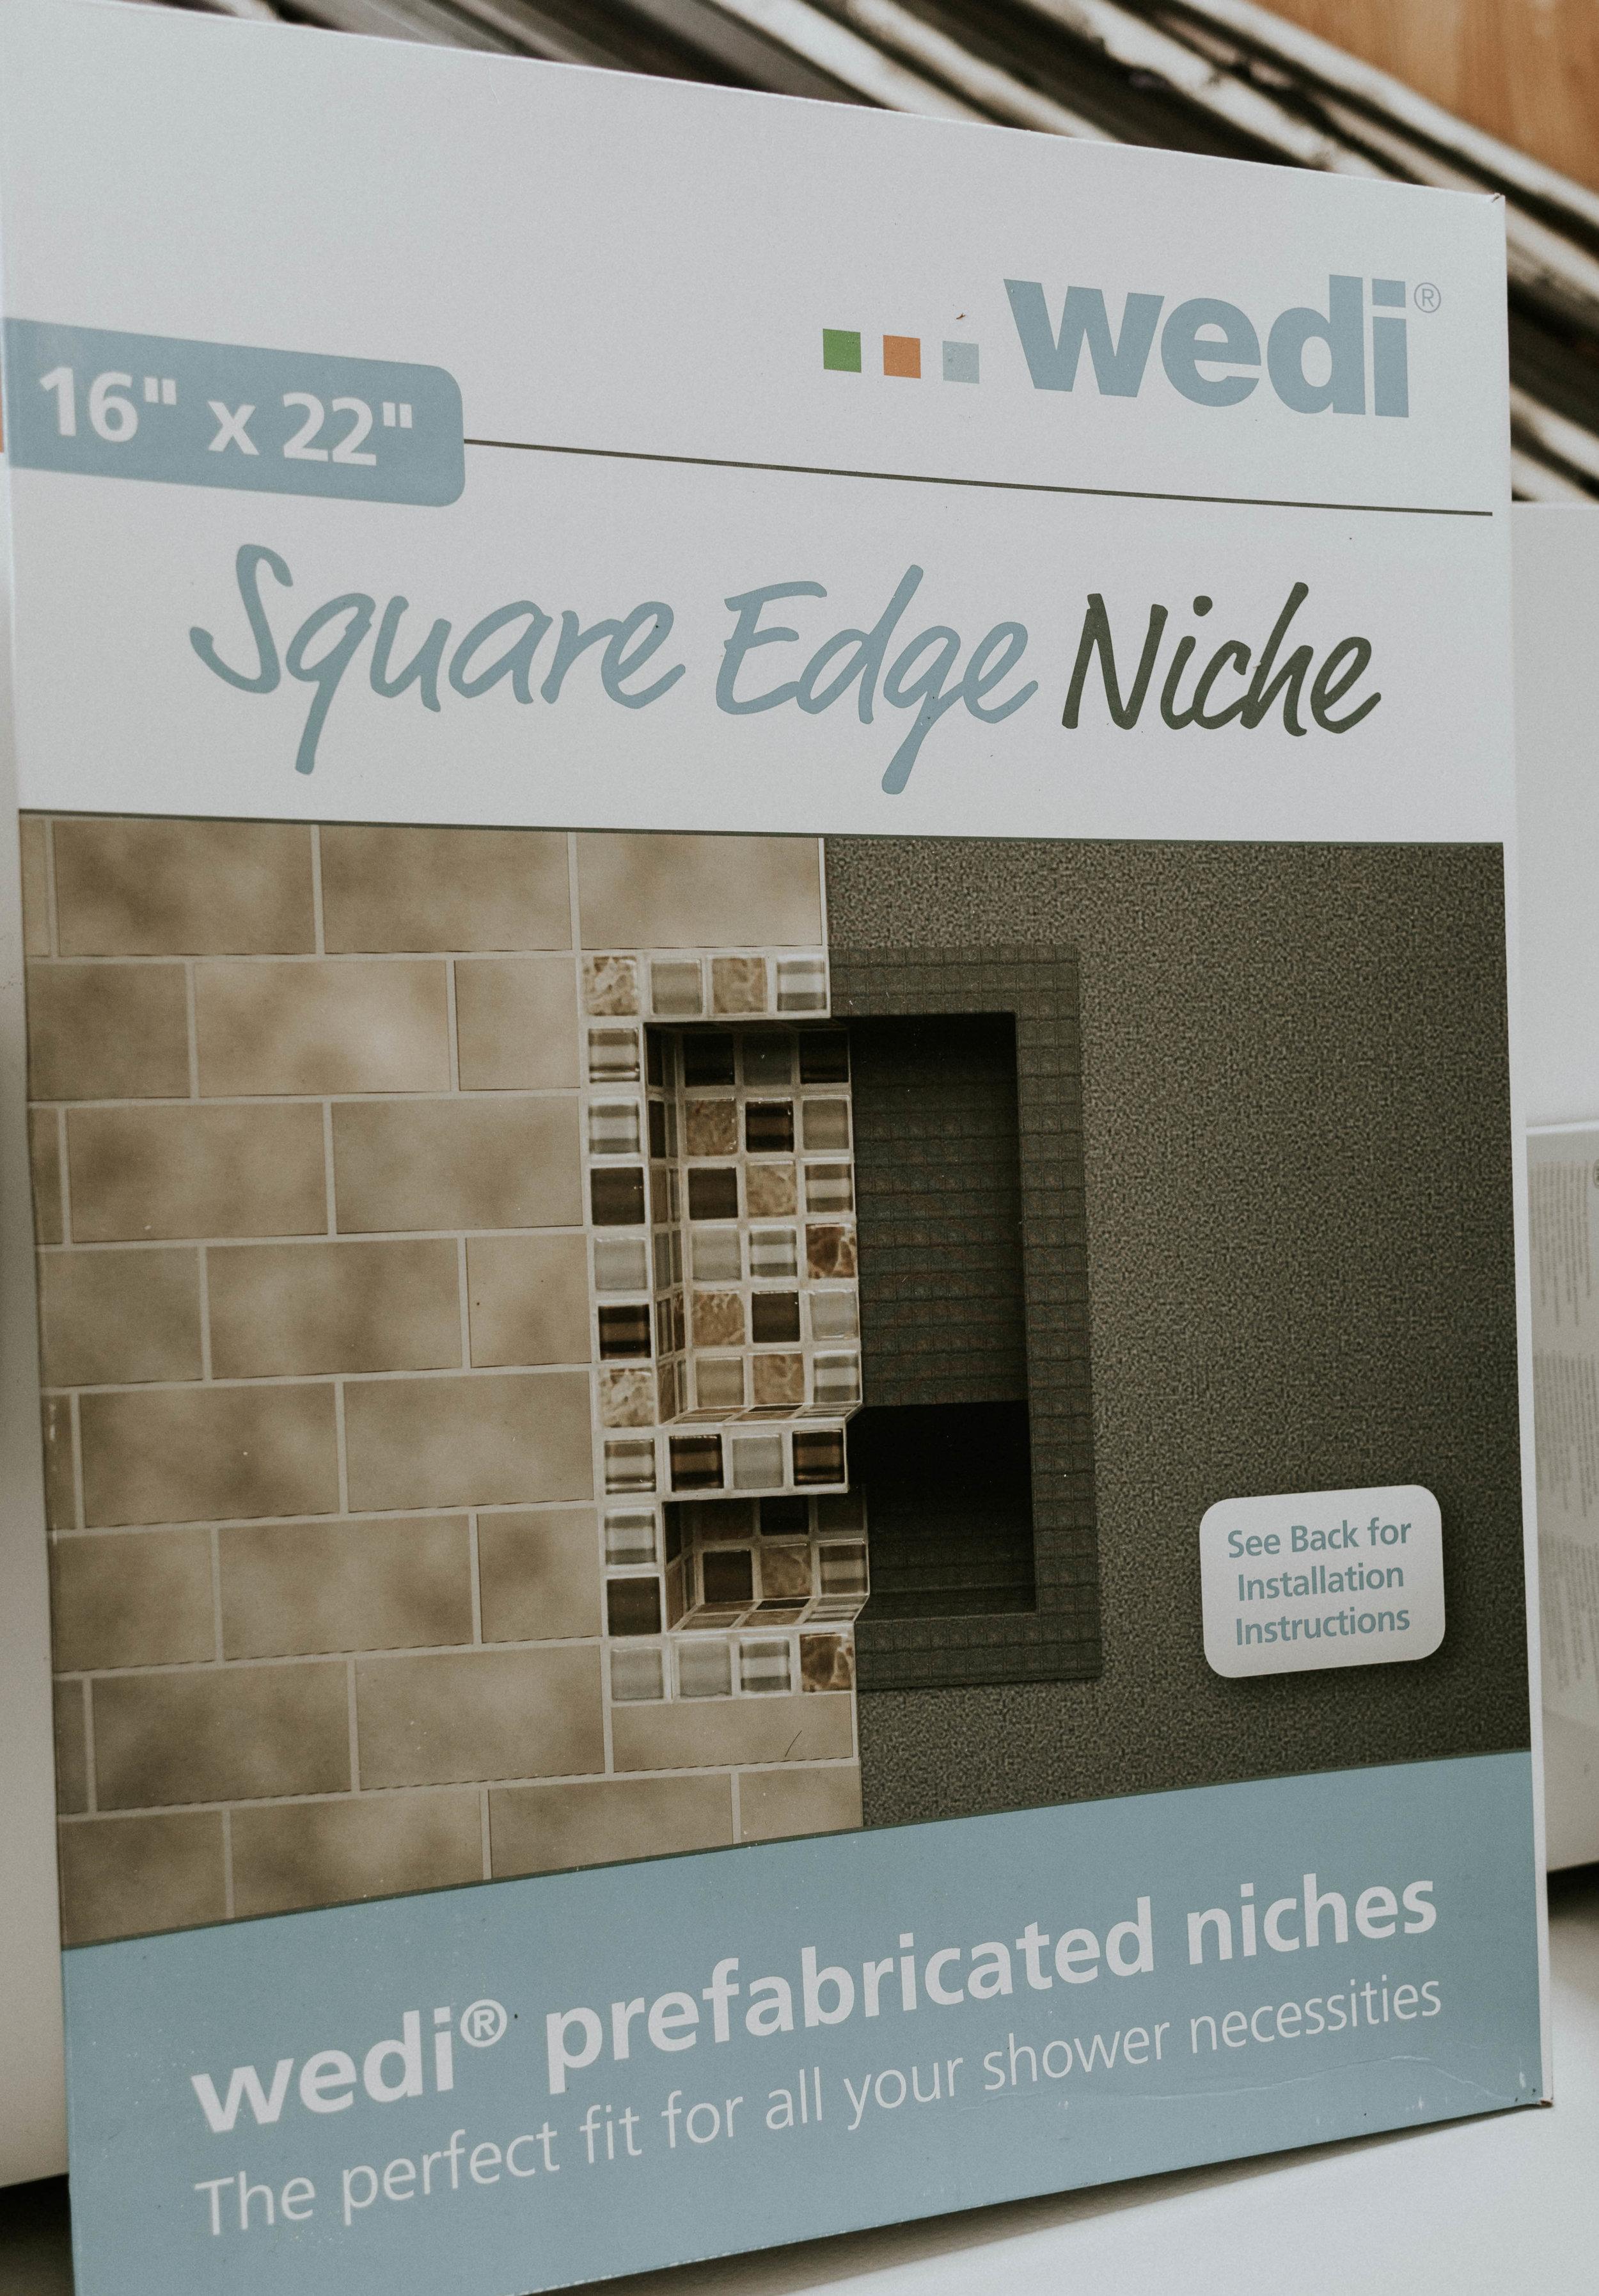 WEDI SQUARE EDGE SHOWER NICHE 16X22(1 of 1).jpg